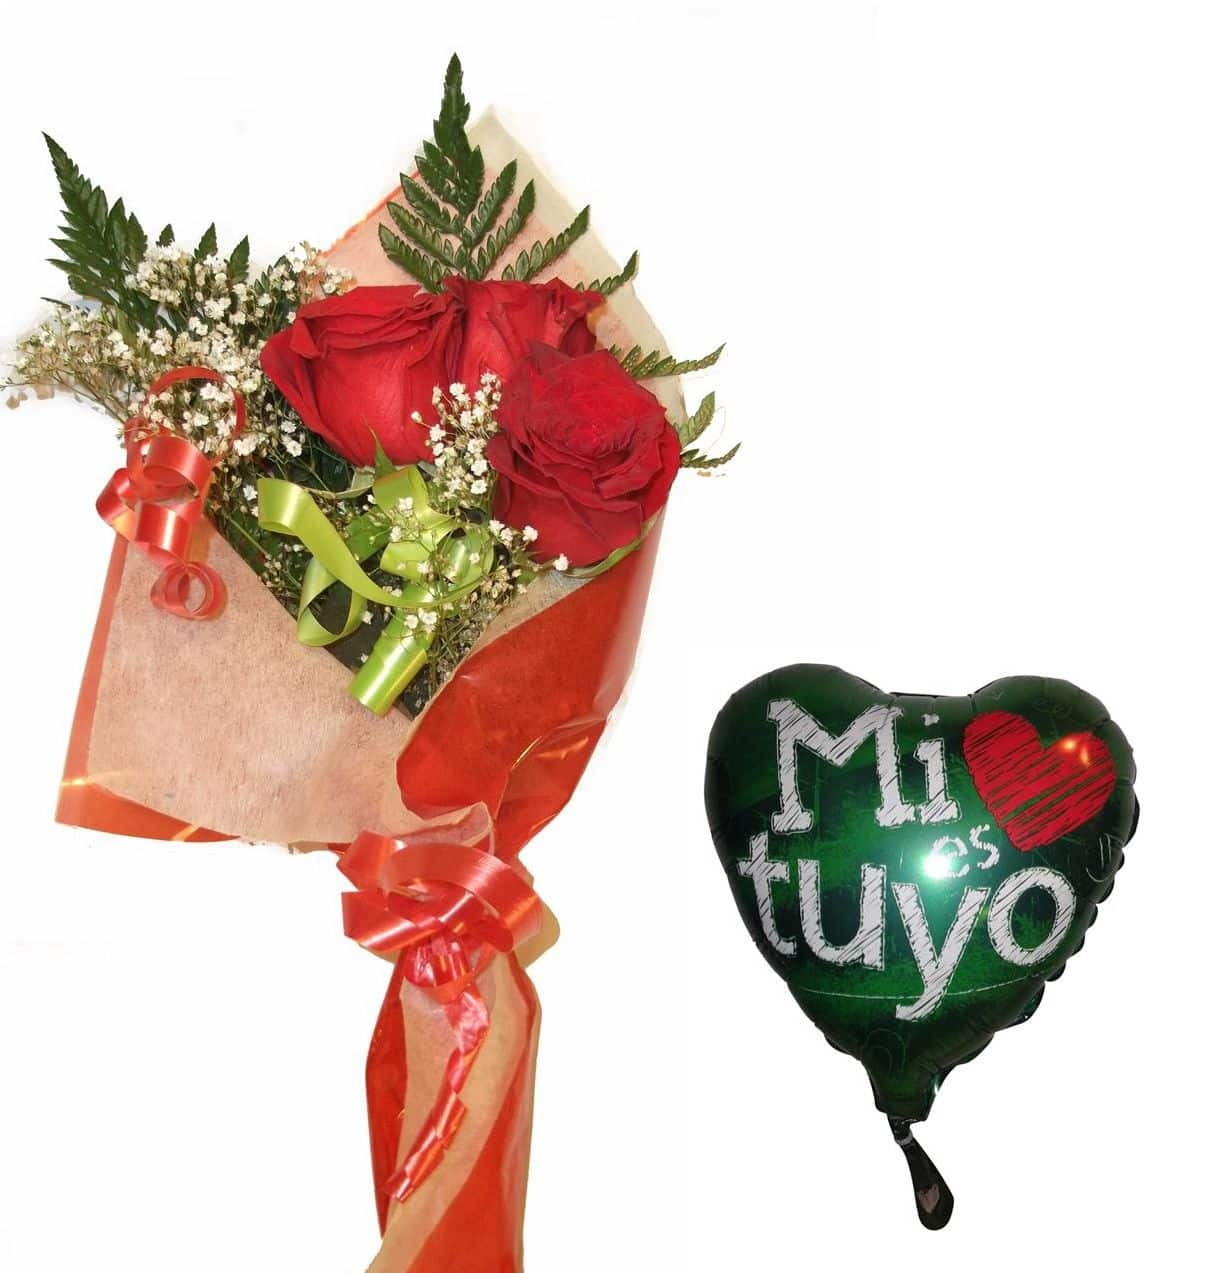 Envio de ramo de tres rosas a domicilio con globo a elegir